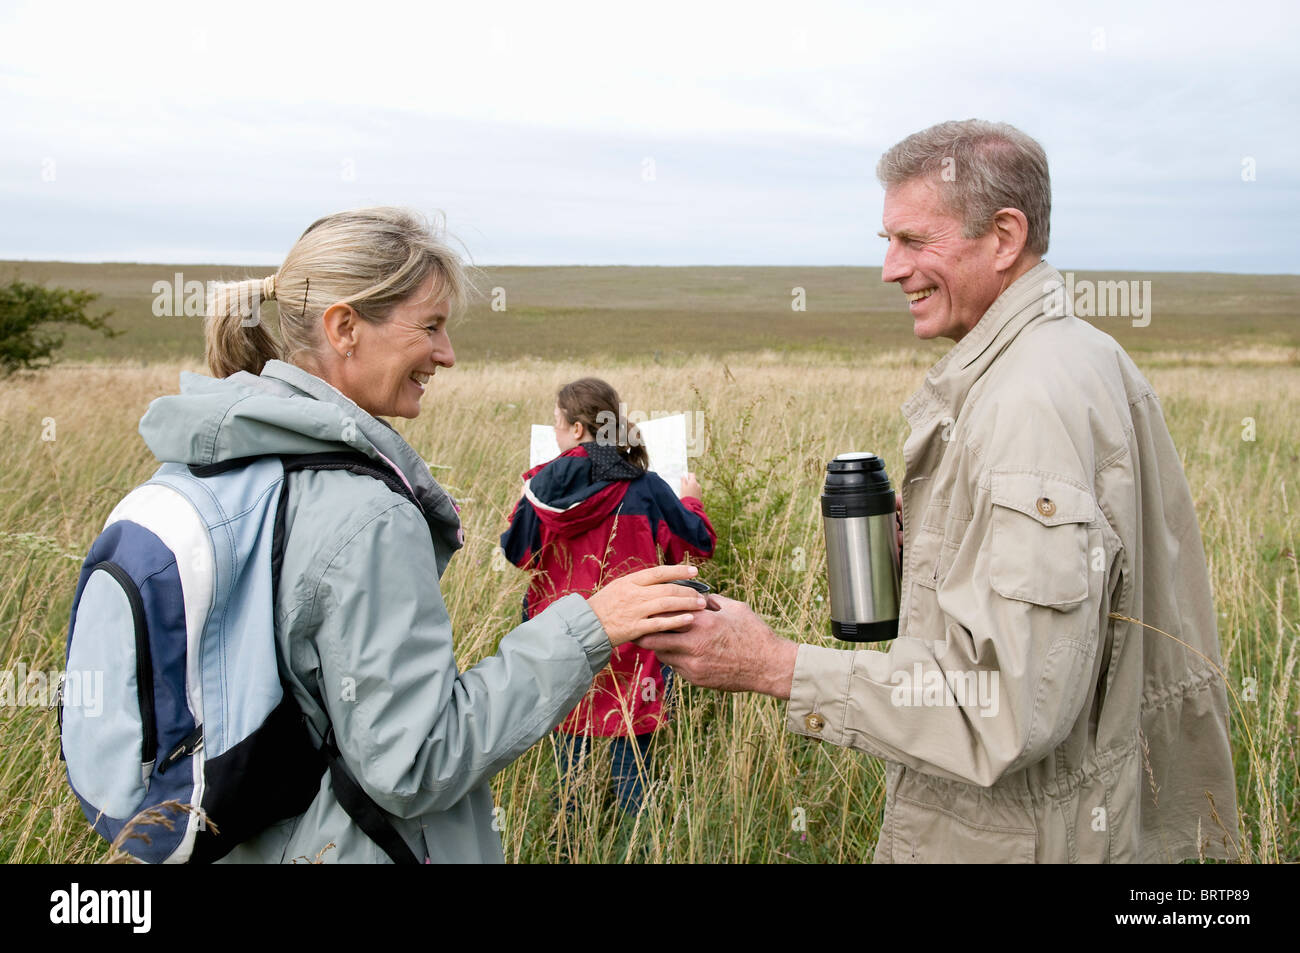 Seniors and grandchild pause on walk - Stock Image